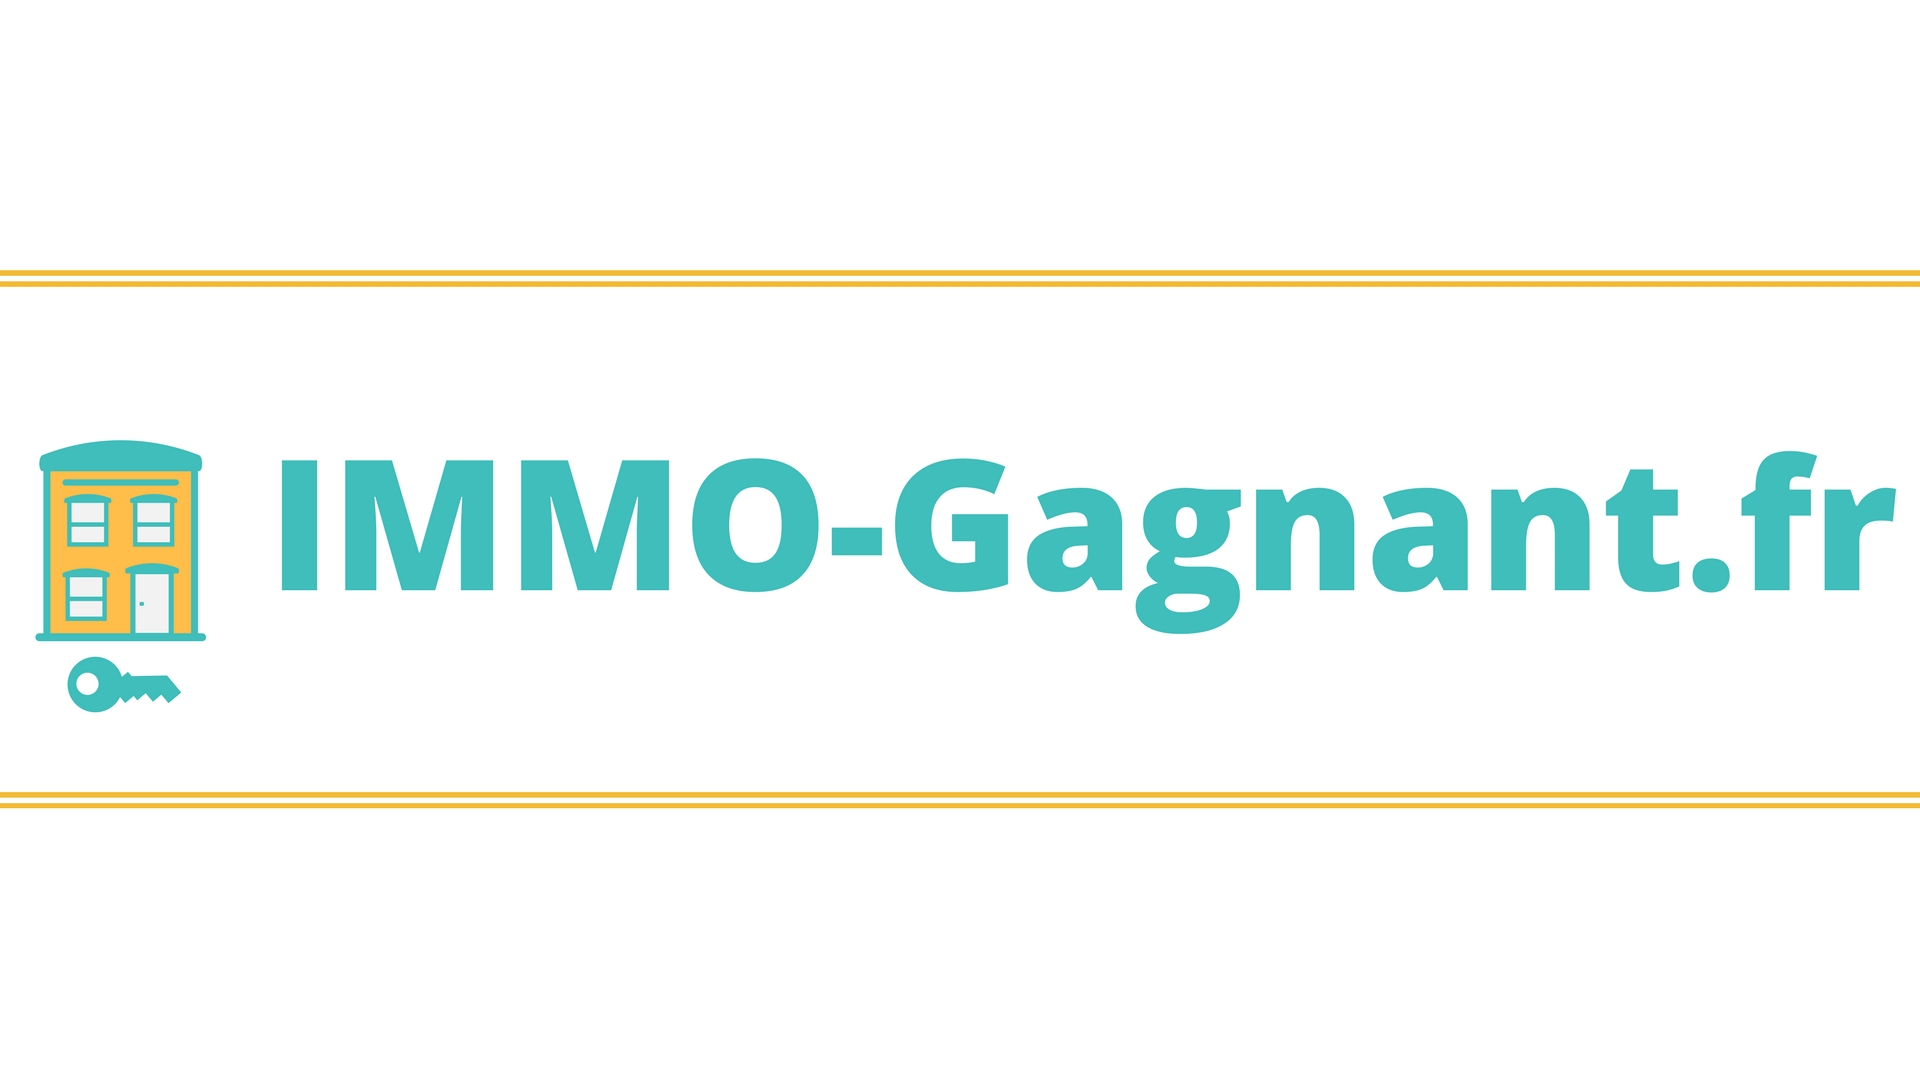 Immo-Gagnant.fr